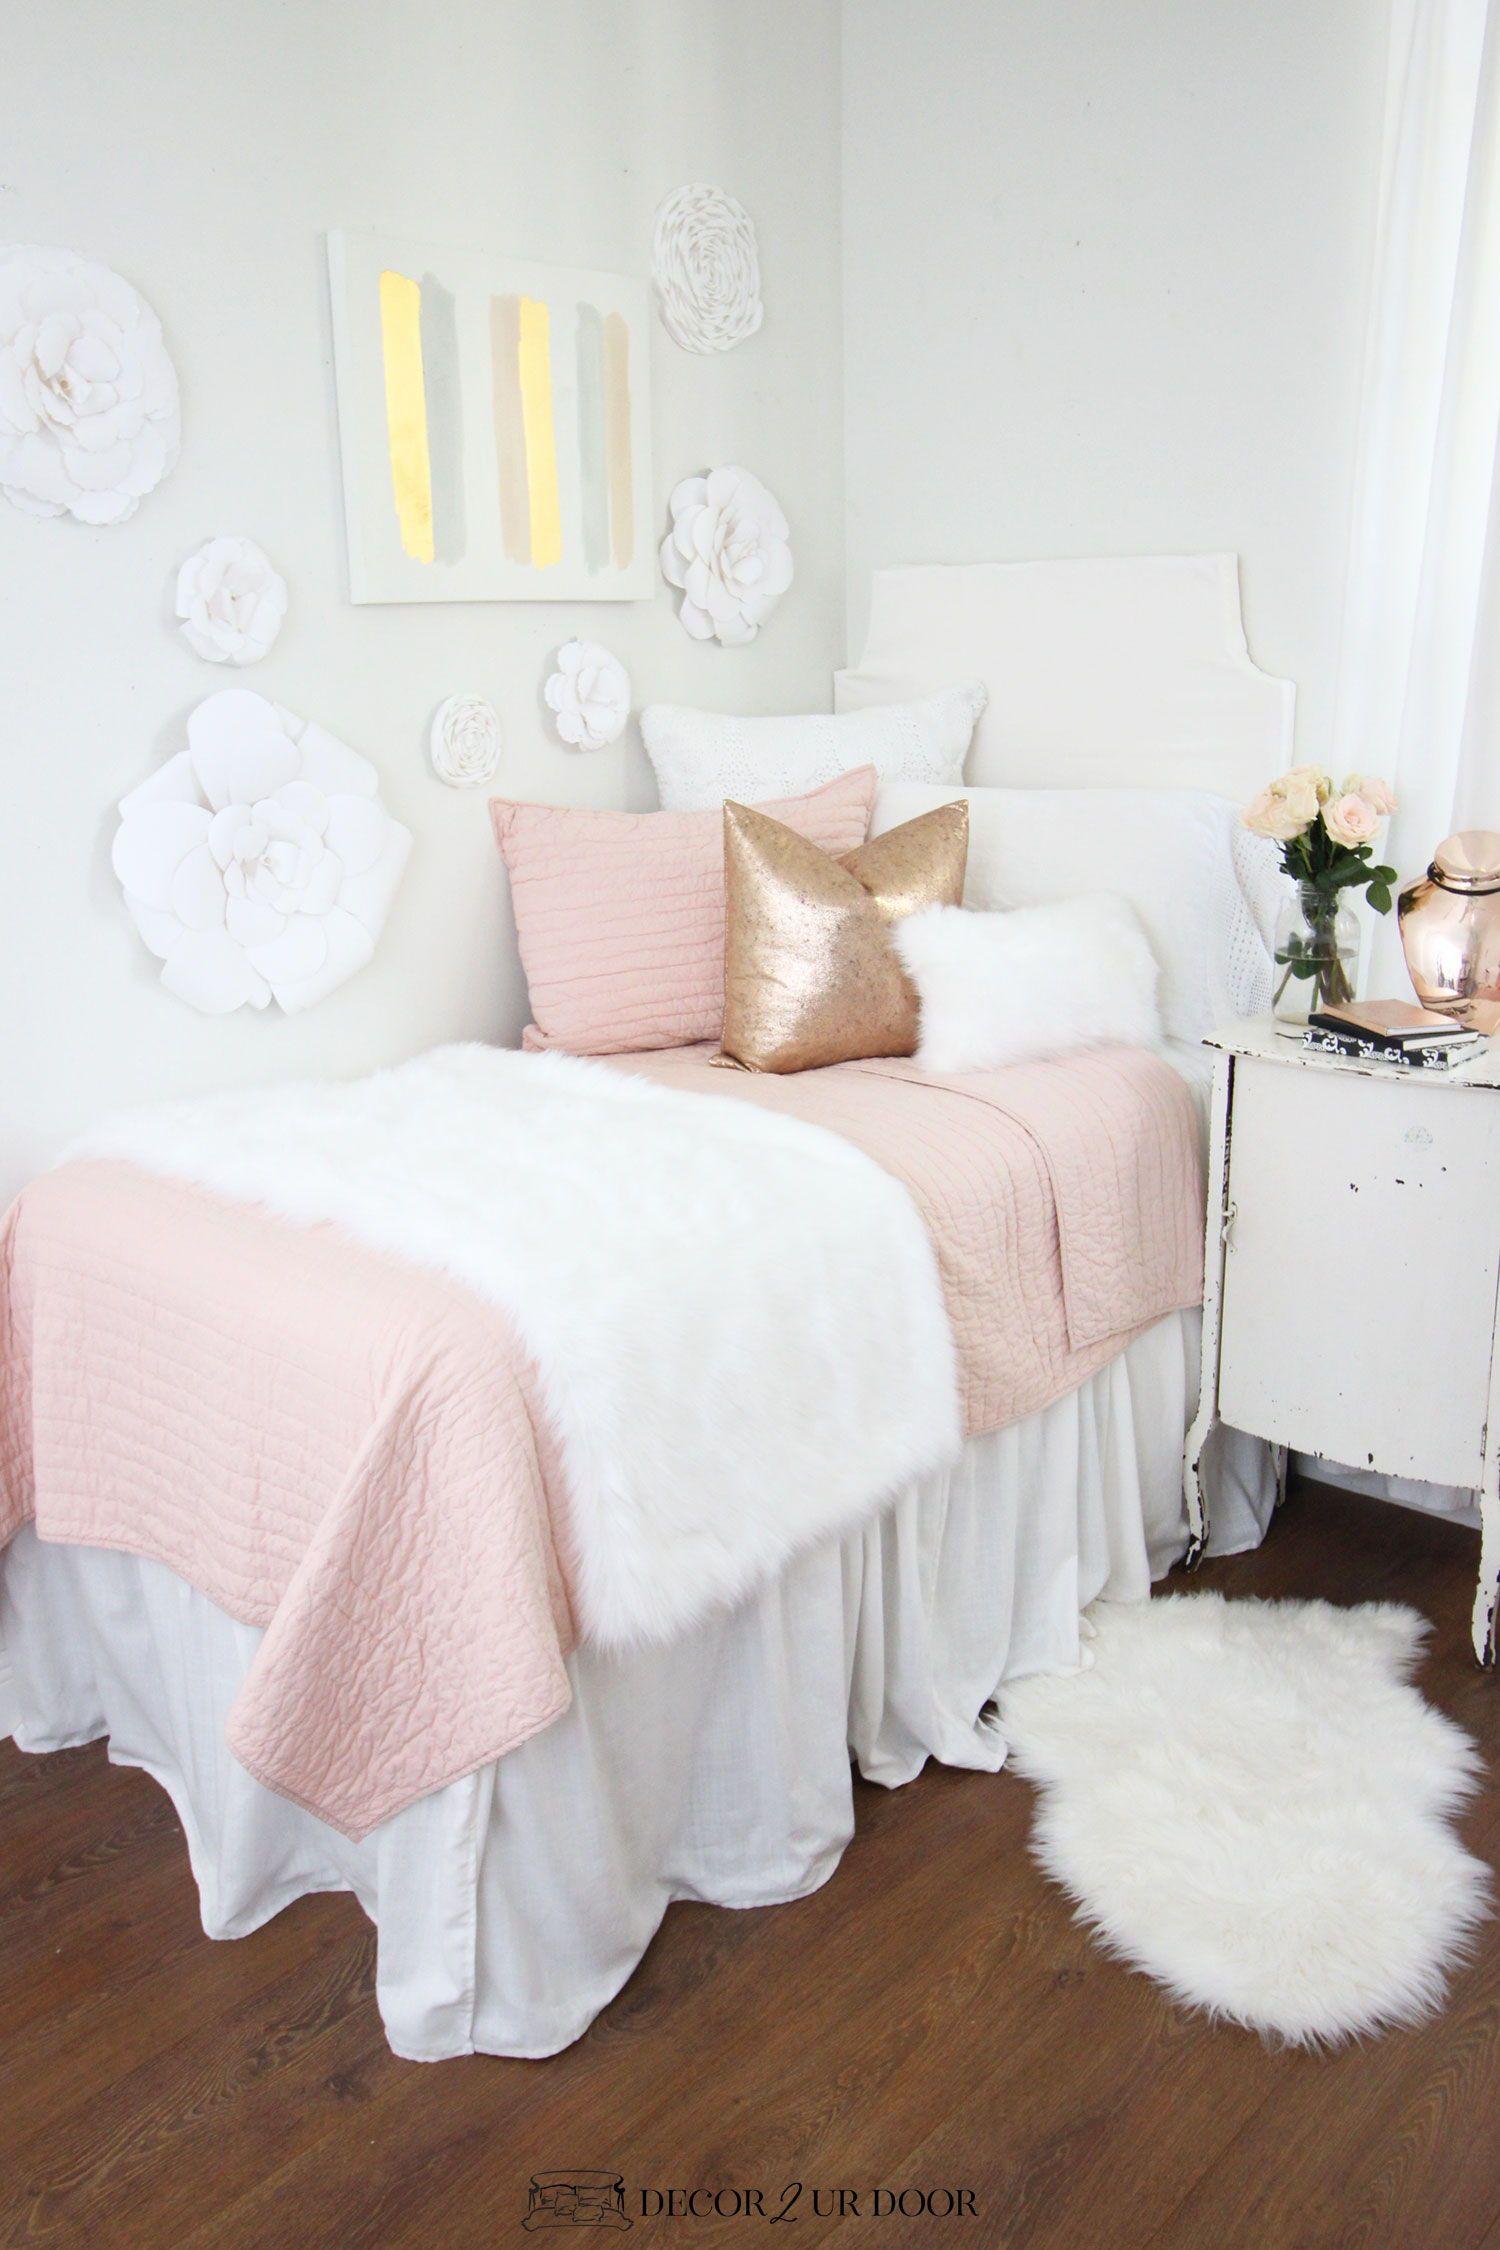 Blush Pink Dorm Room Ideas and Inspiration  Dorm room decor, Pink